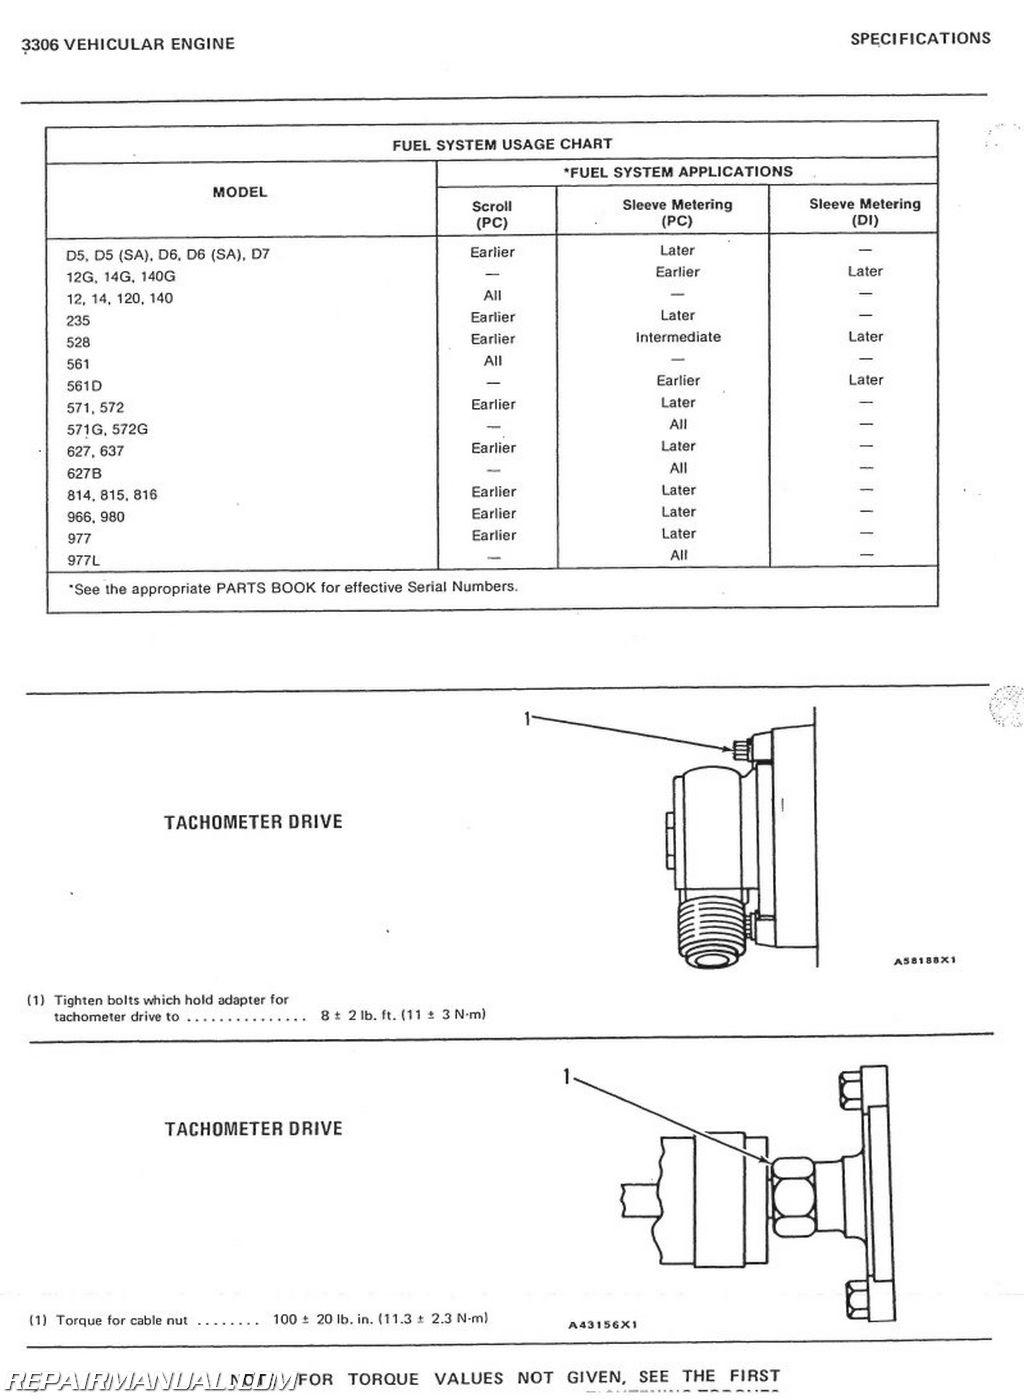 Caterpillar Grader #12F and 14E Service Manual